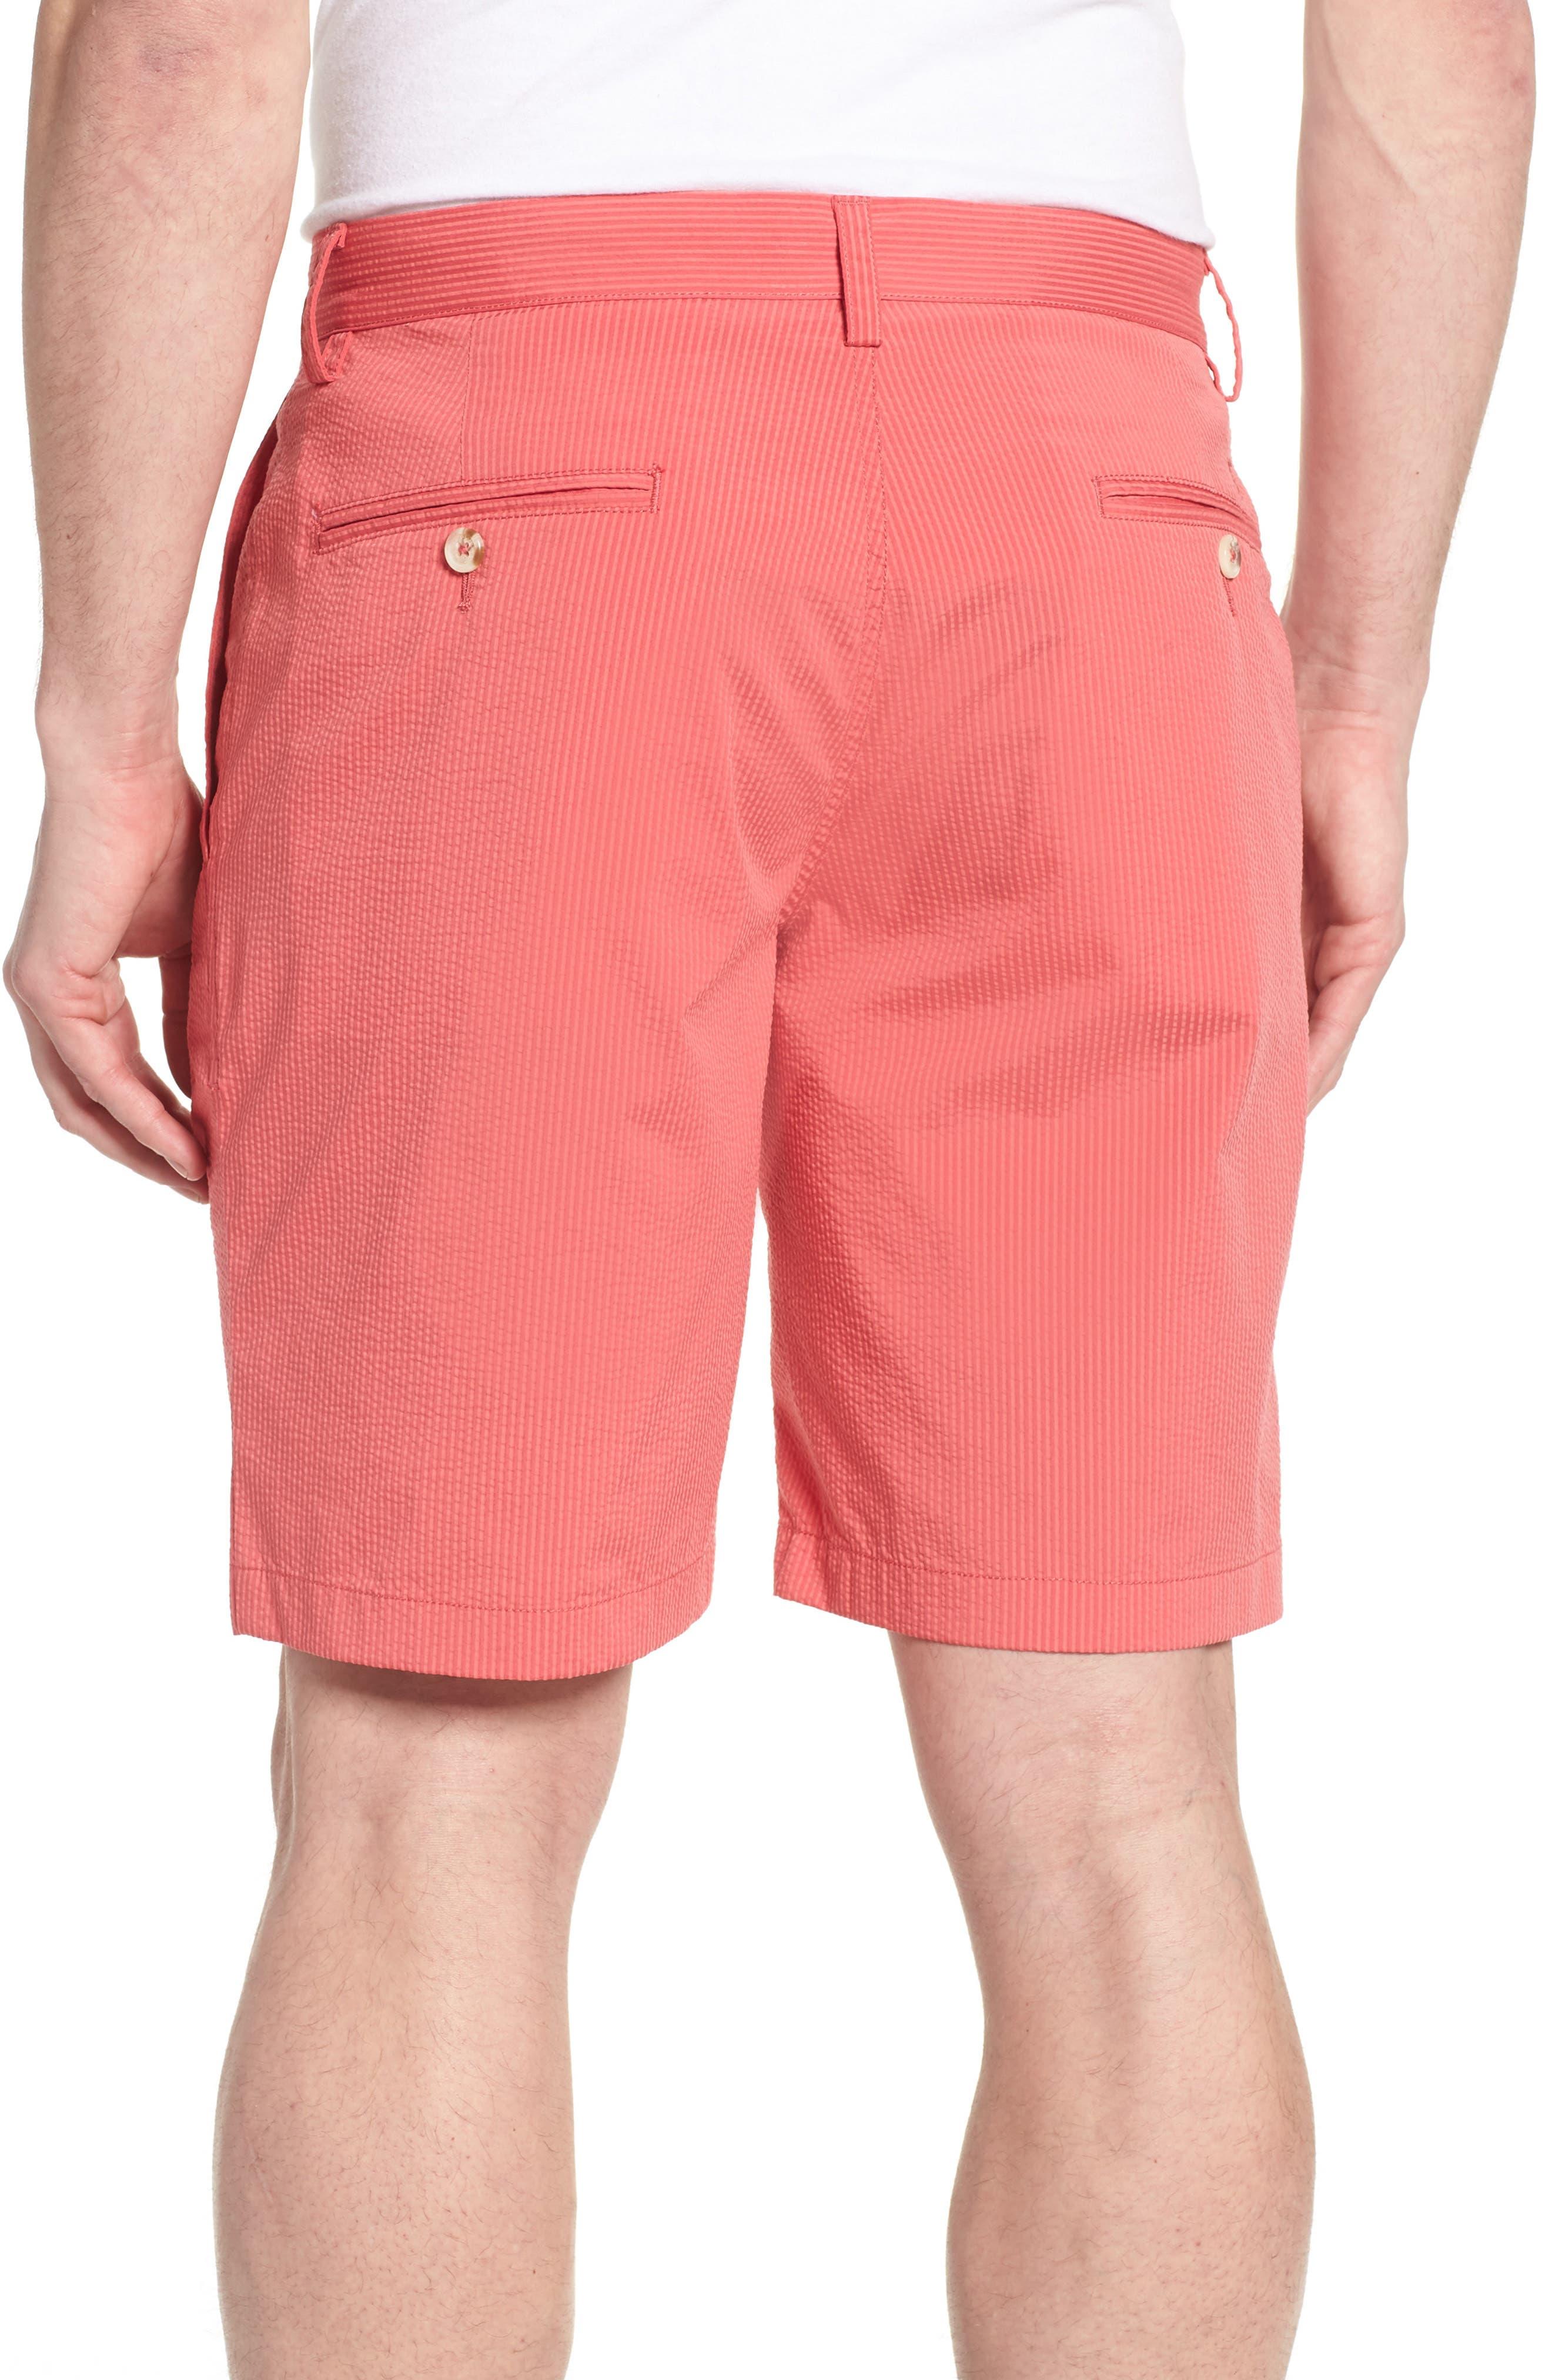 Seersucker Shorts,                             Alternate thumbnail 4, color,